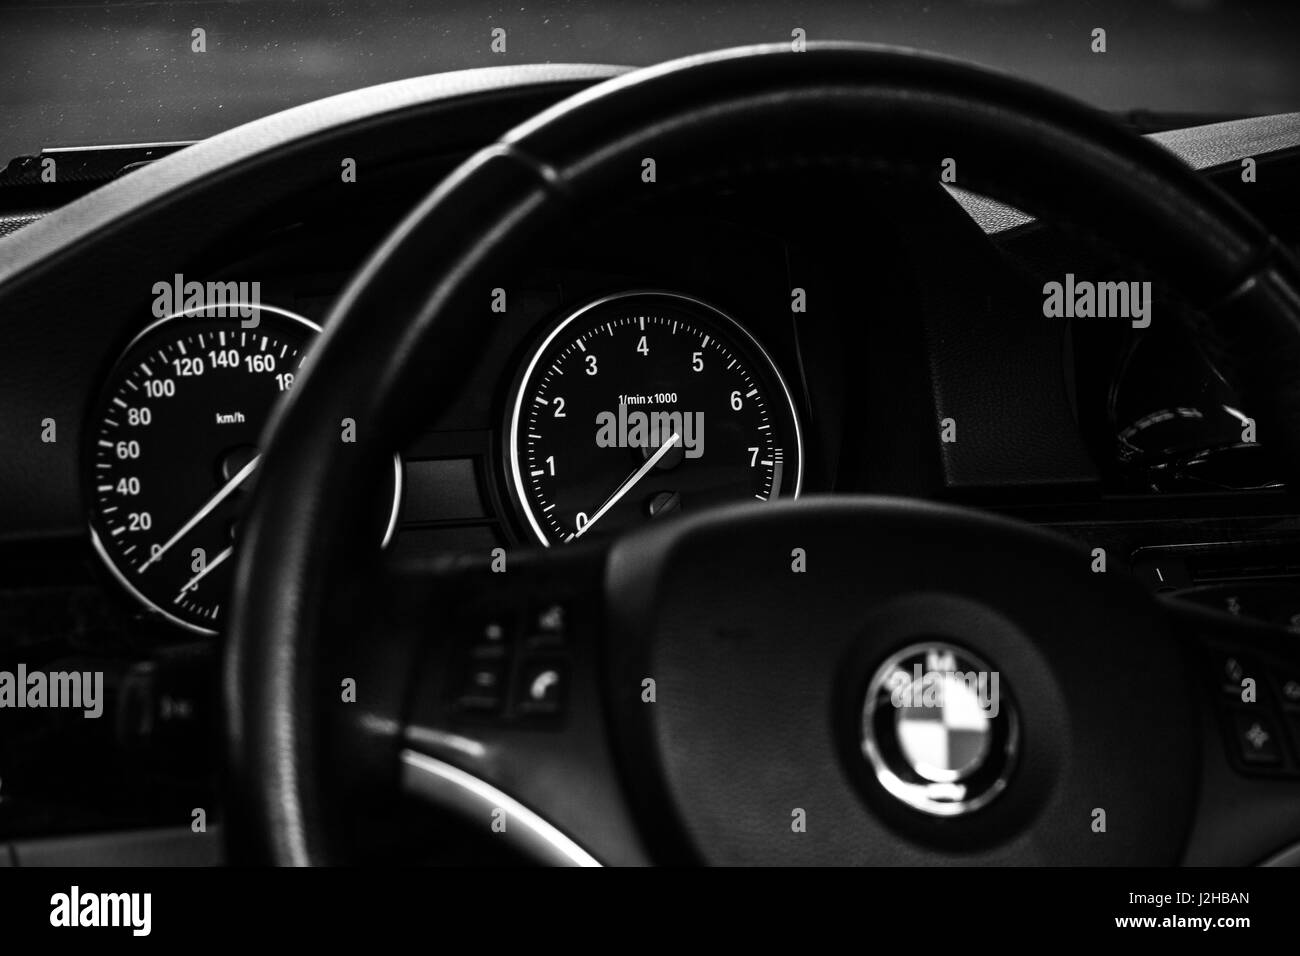 Bmw 3 Series E92 Full Hd Fond D écran 4k Uhd Monaco Blue M